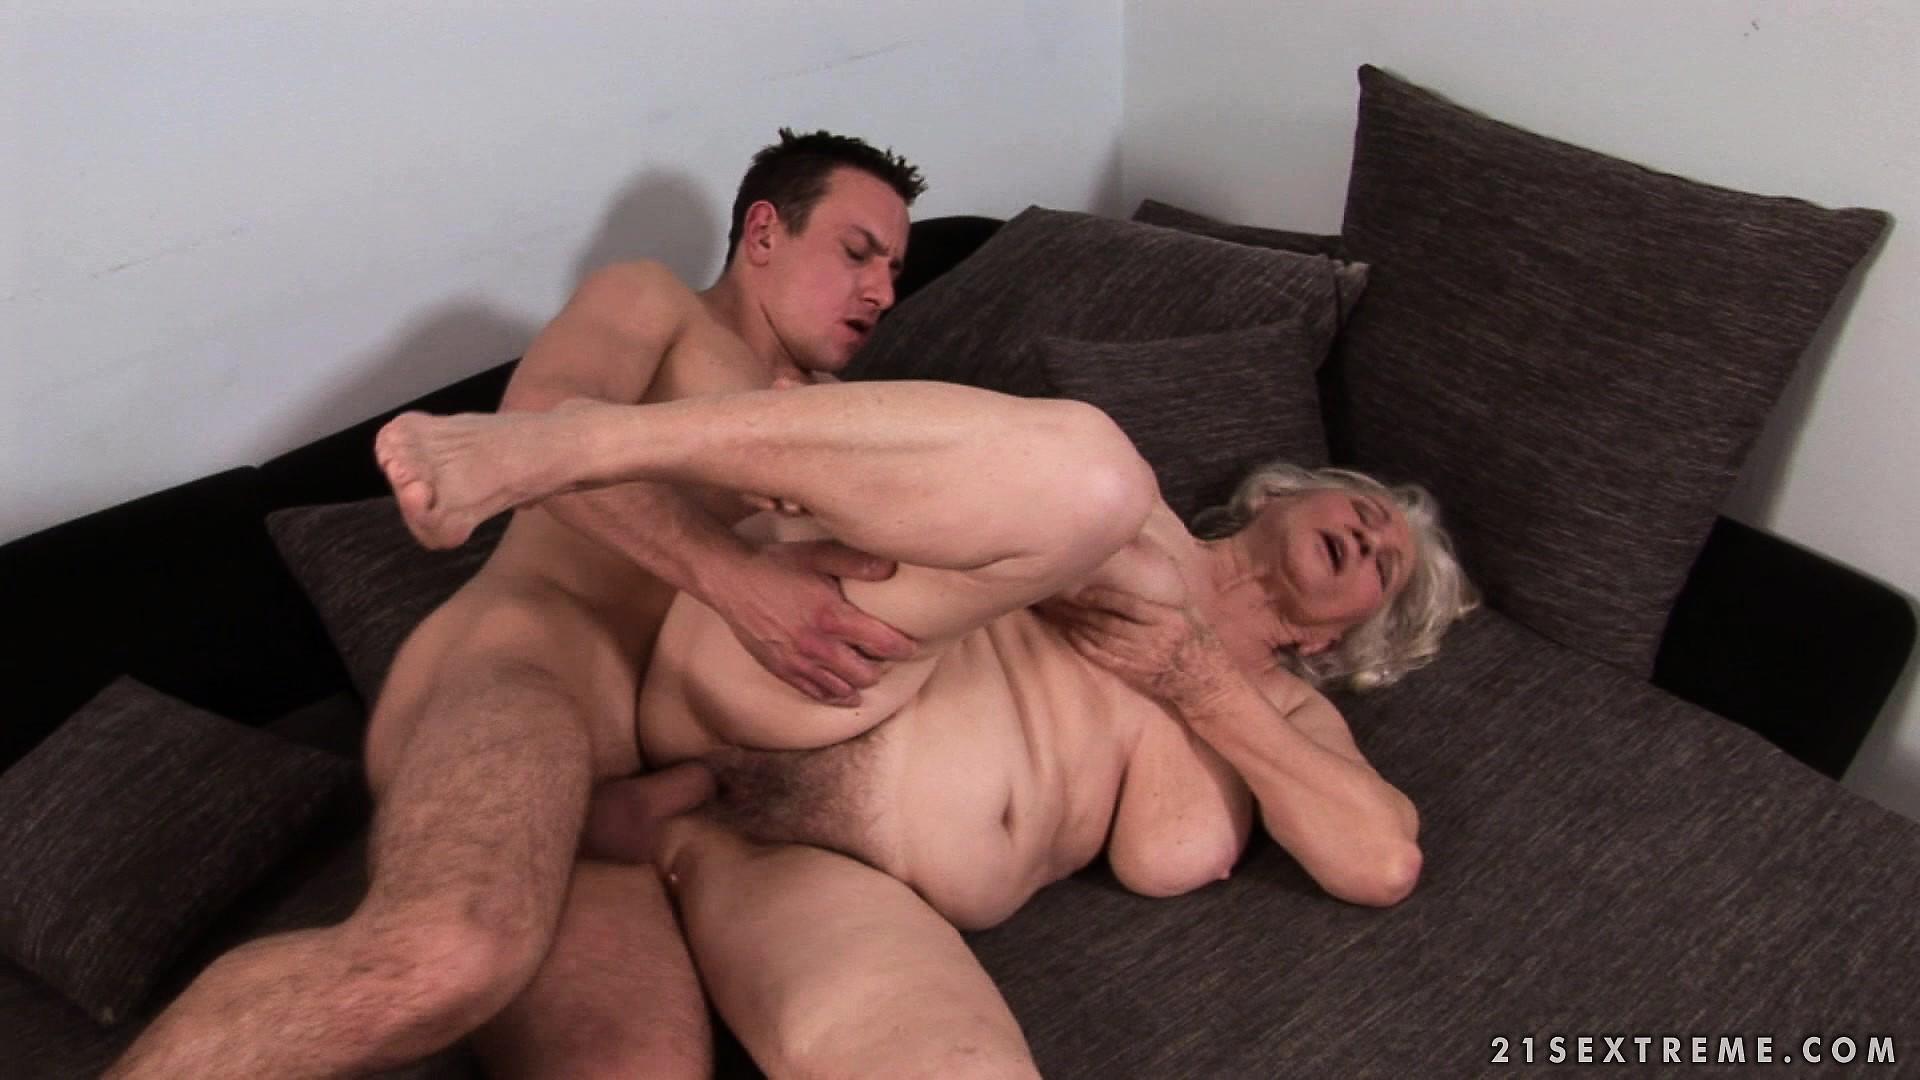 Free Mobile Porn & Sex Videos & Sex Movies - Big Saggy Tit ...